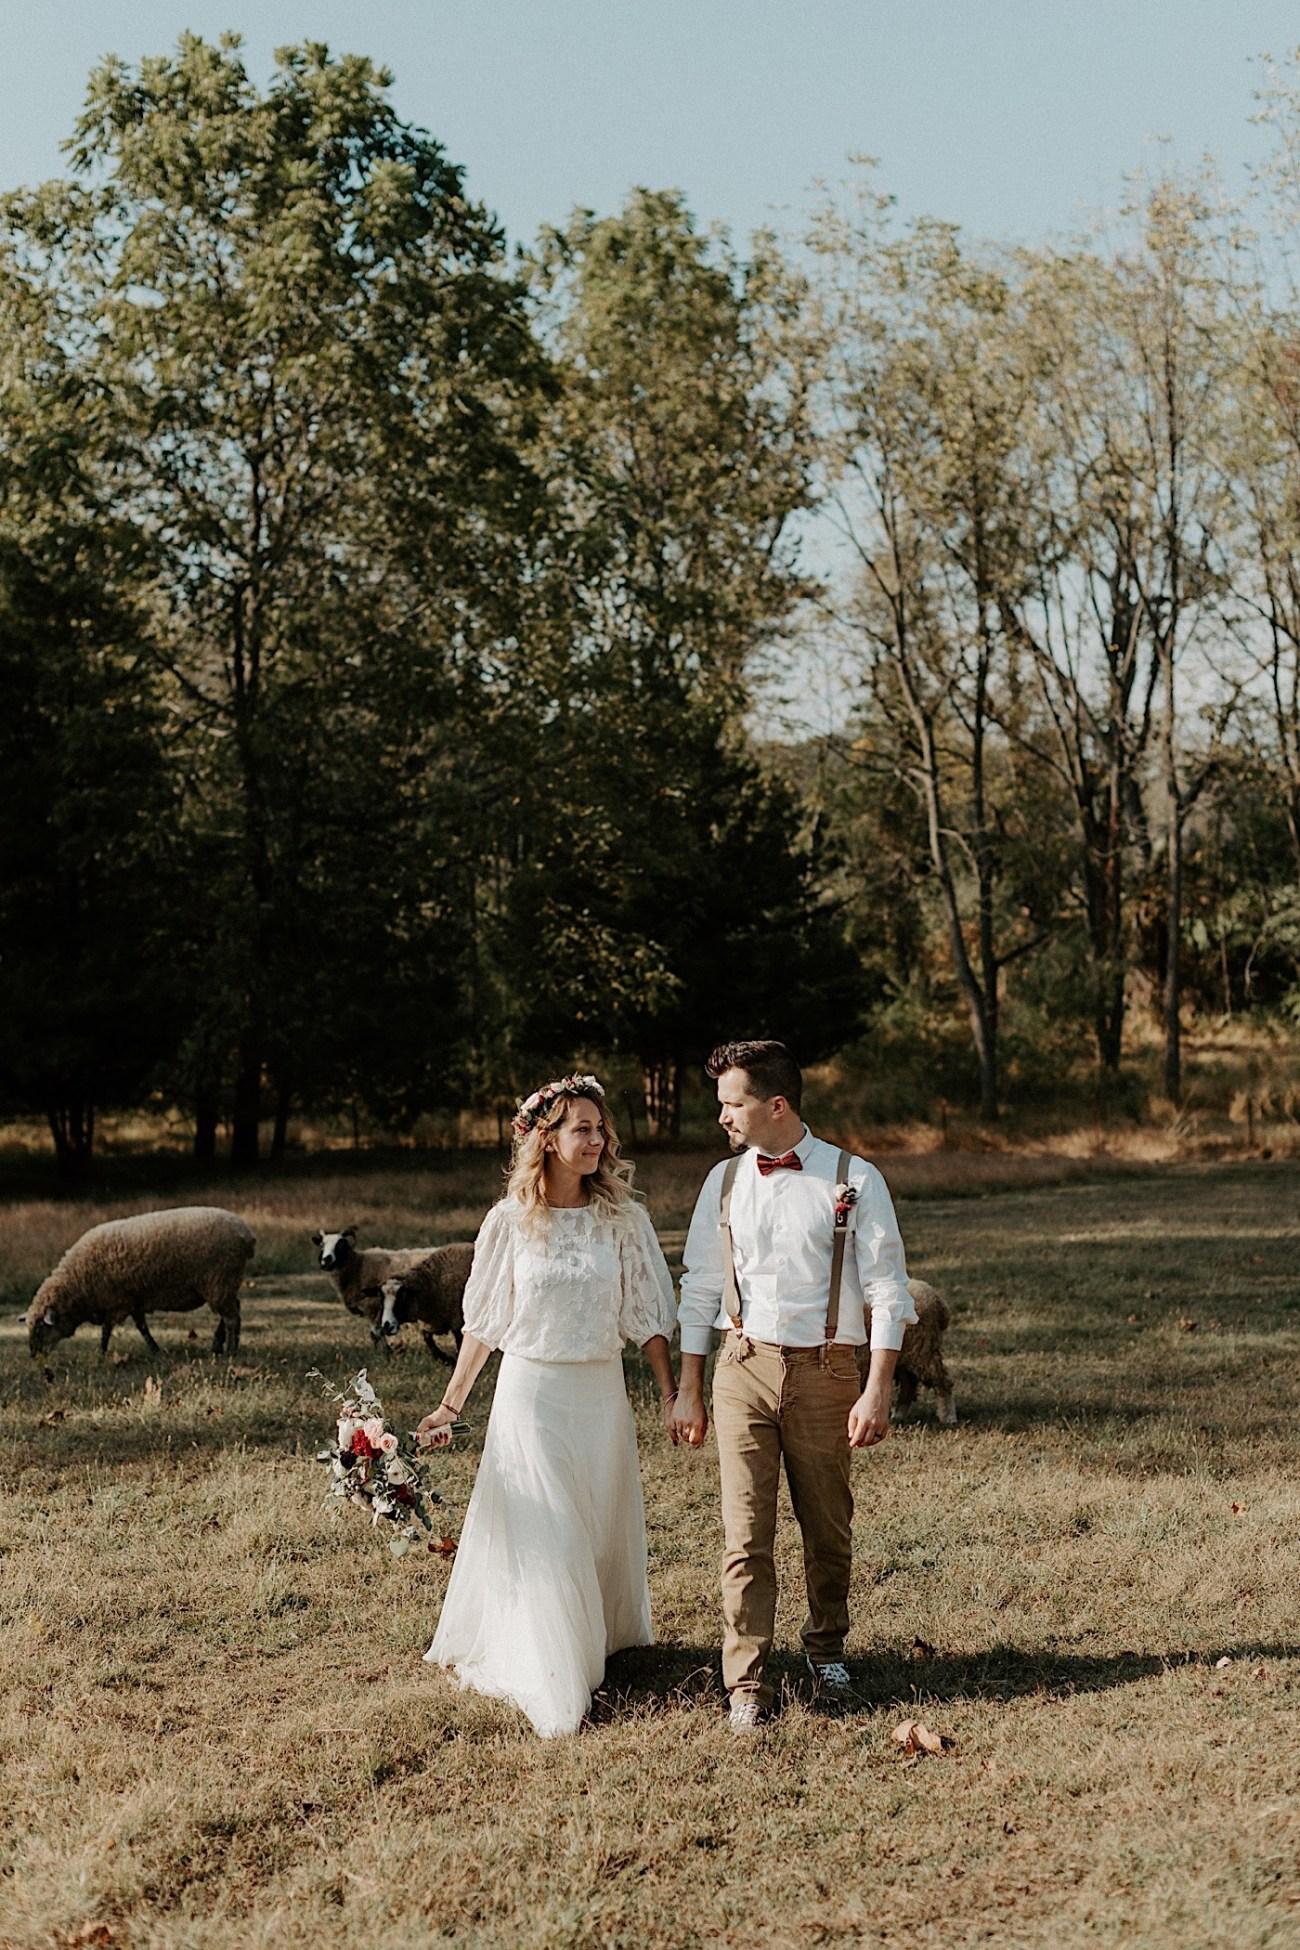 Woolverton Inn Elopement NJ Wedding Photographer Boho Wedding 019